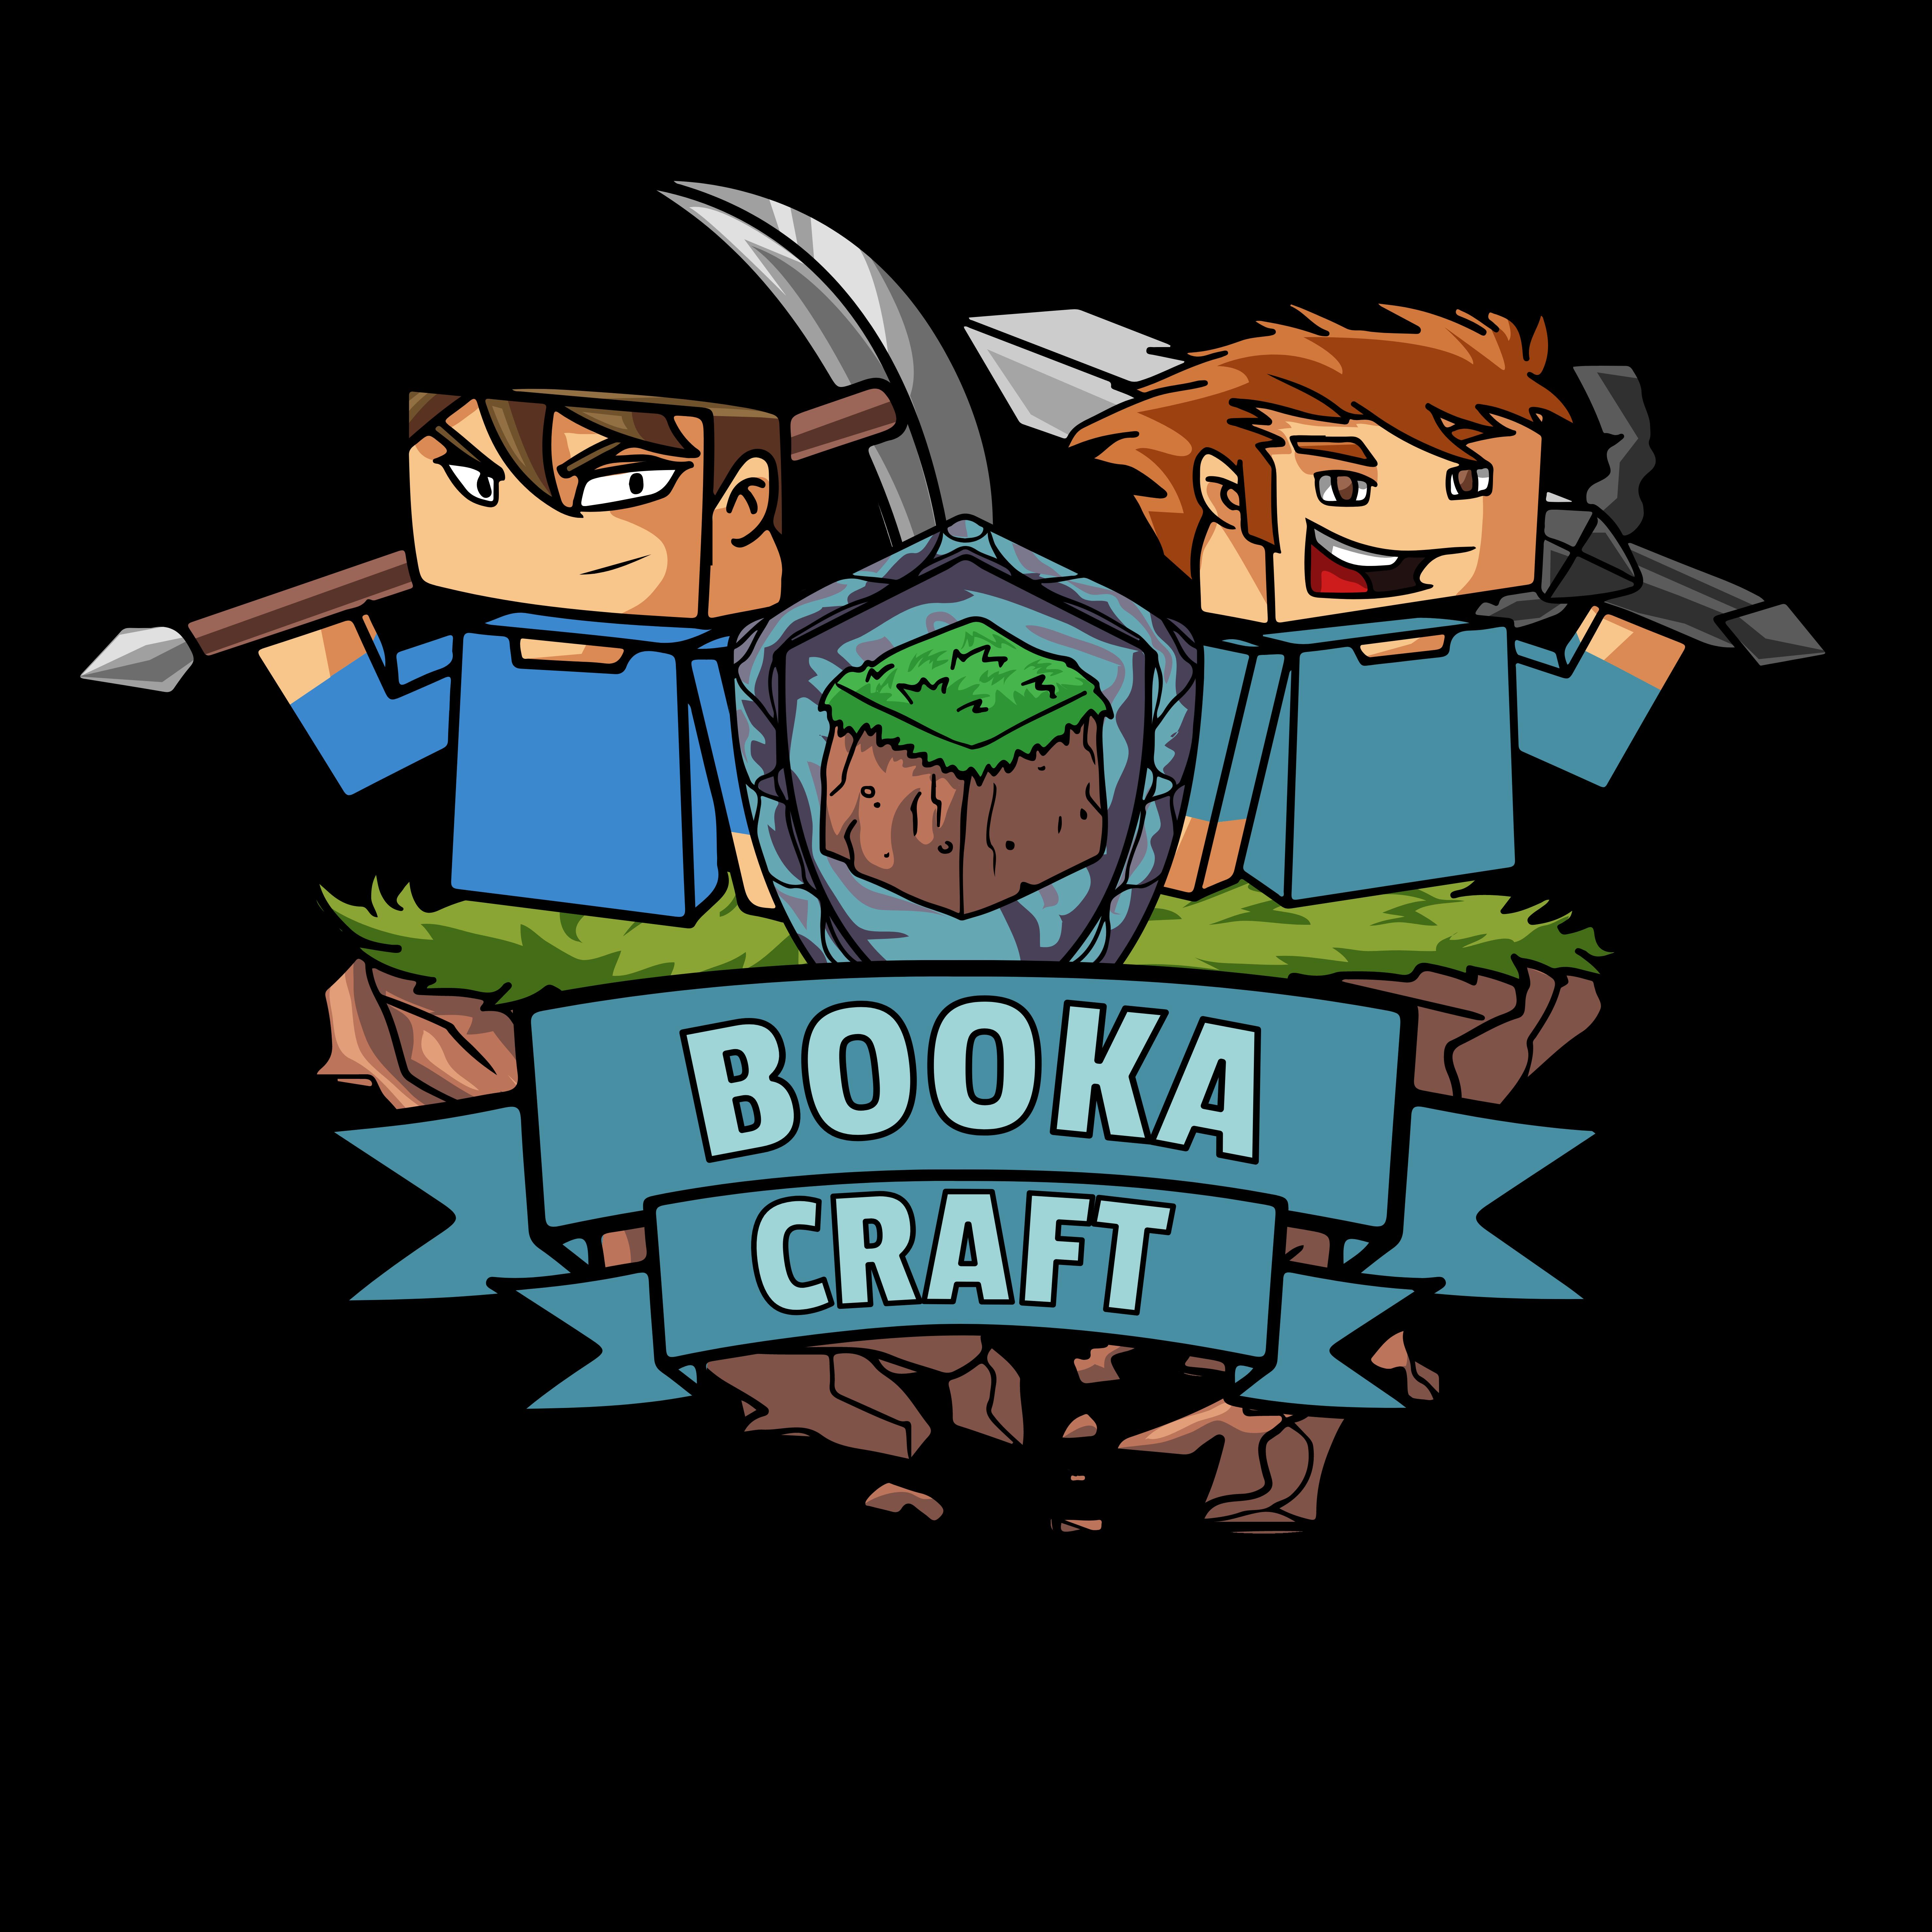 BookaCraft